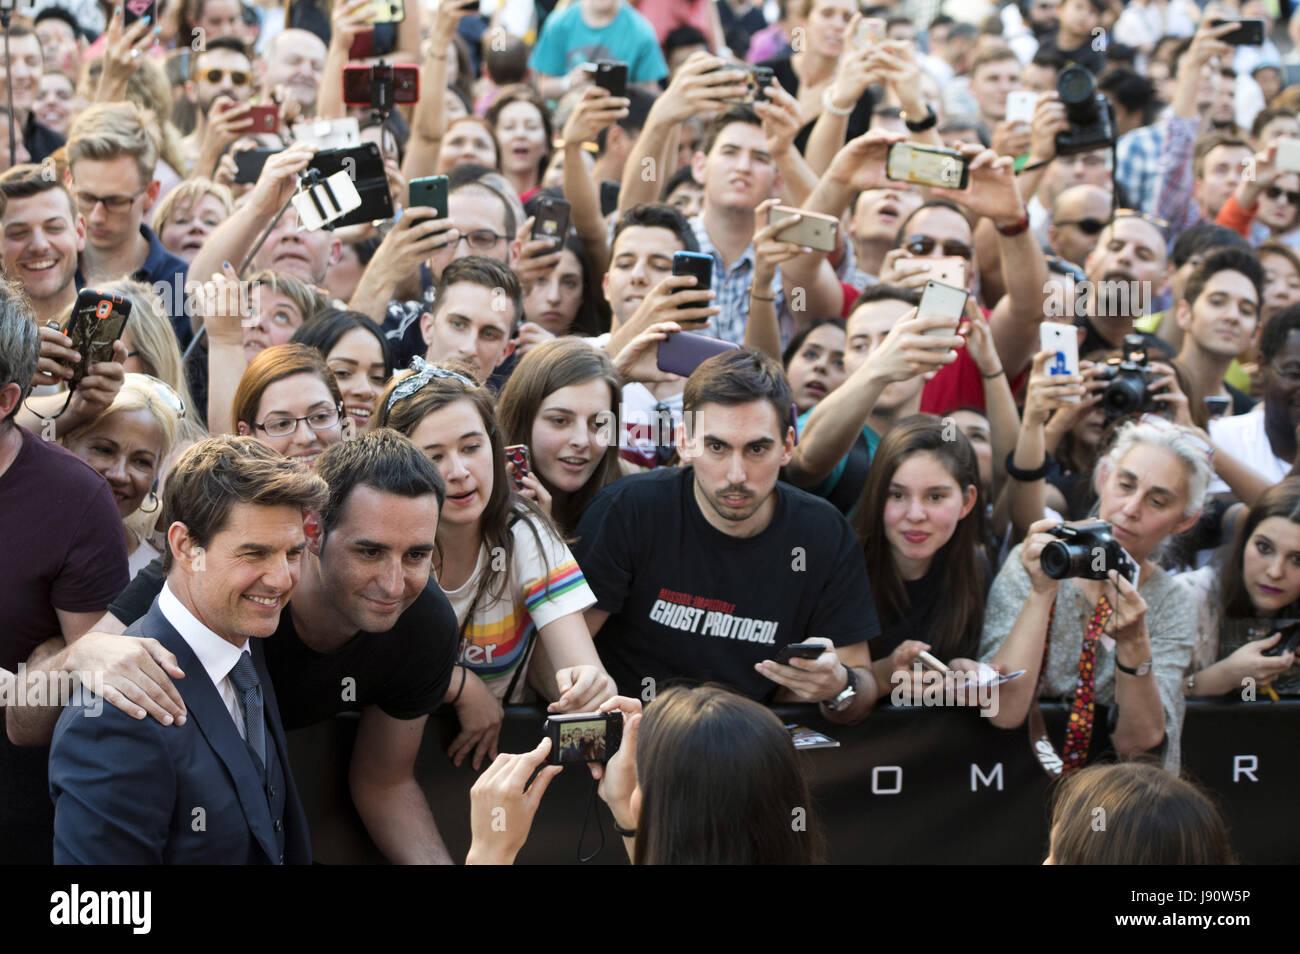 Madrid, Espagne. 29 mai, 2017. Tom Cruise participe à 'La momie' premiere Callao au cinéma le Photo Stock